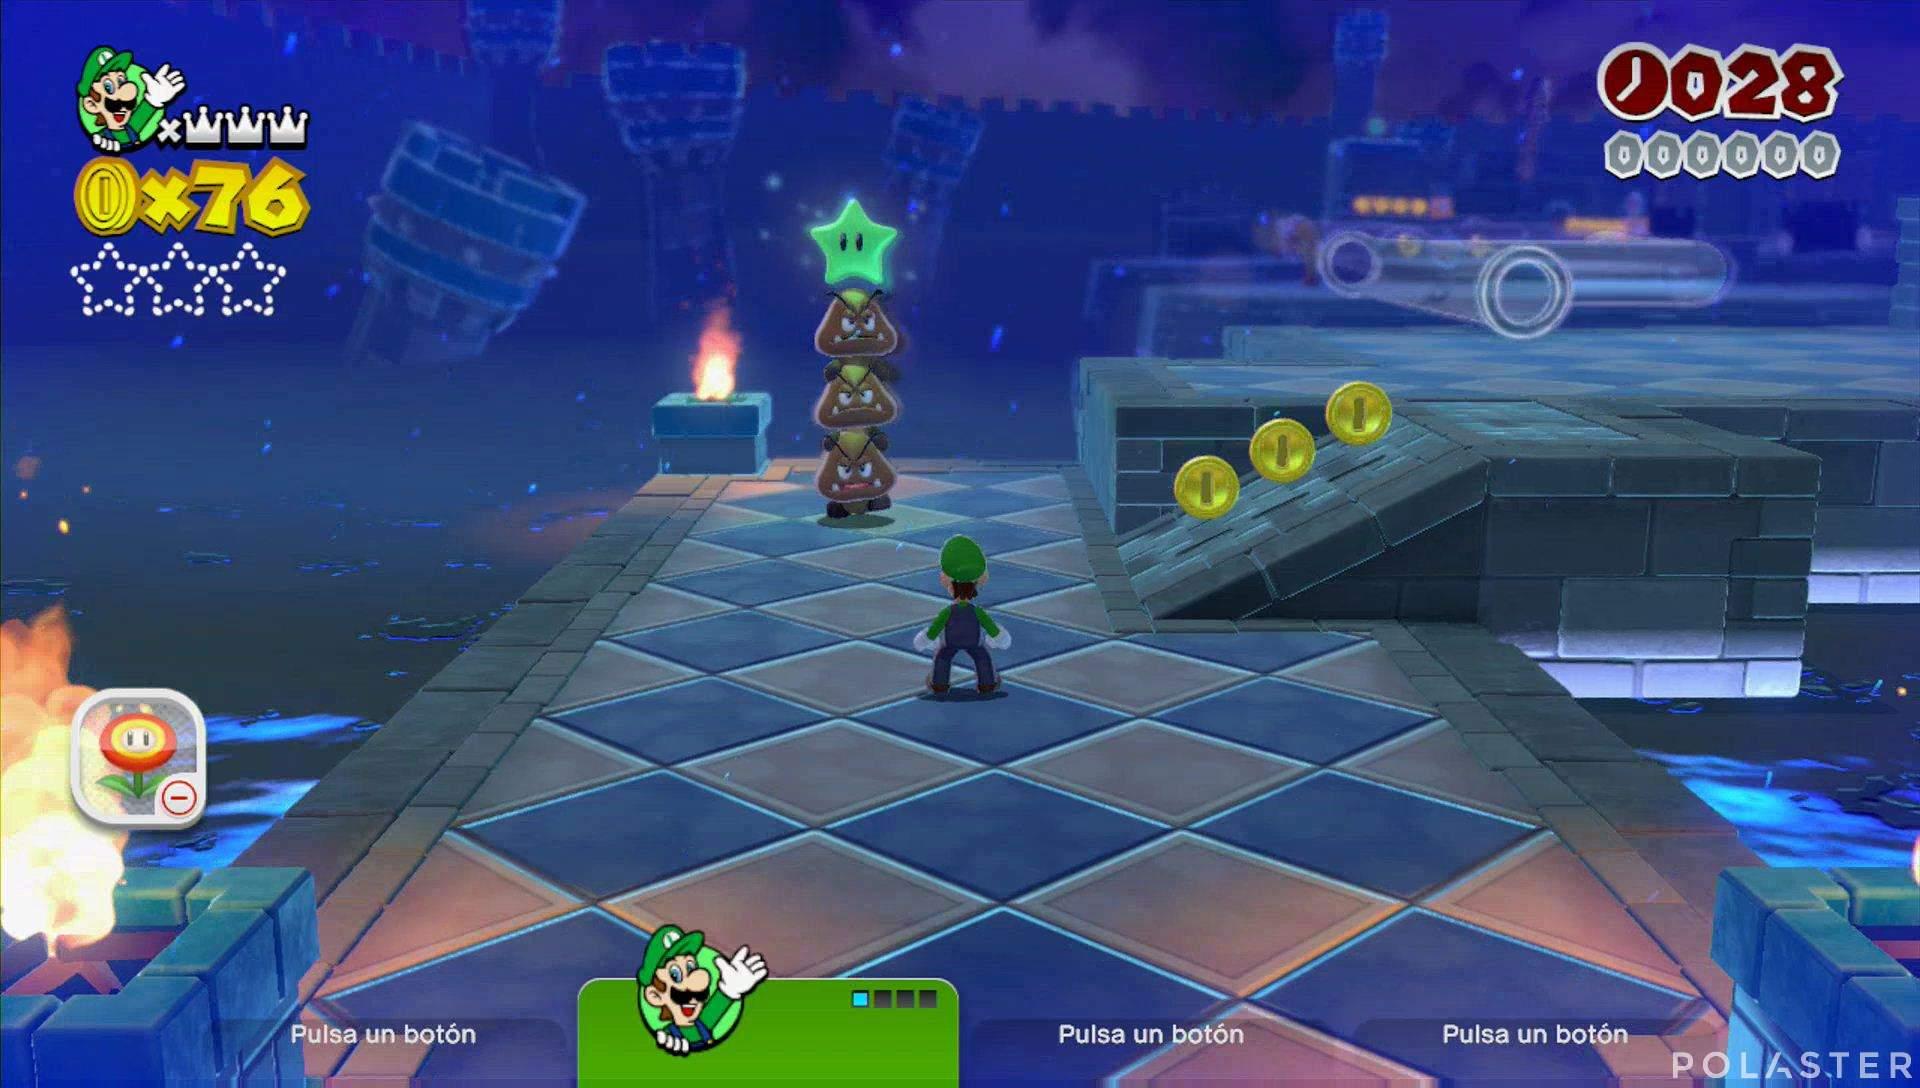 Super Mario 3D World Mundo Flor-4 Estrella 1